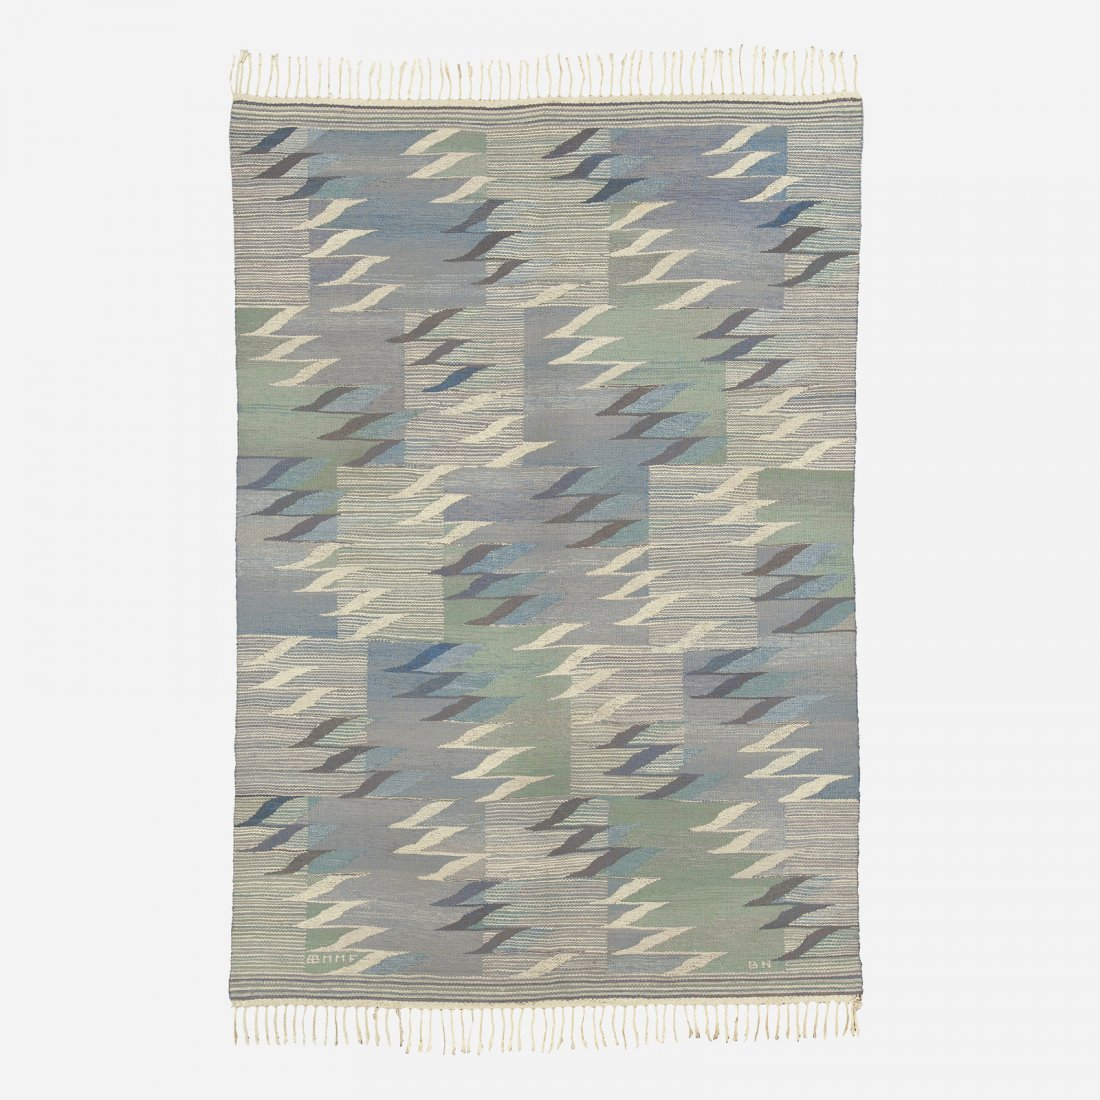 Barbro Nilsson, Snacklosa tapestry weave carpet